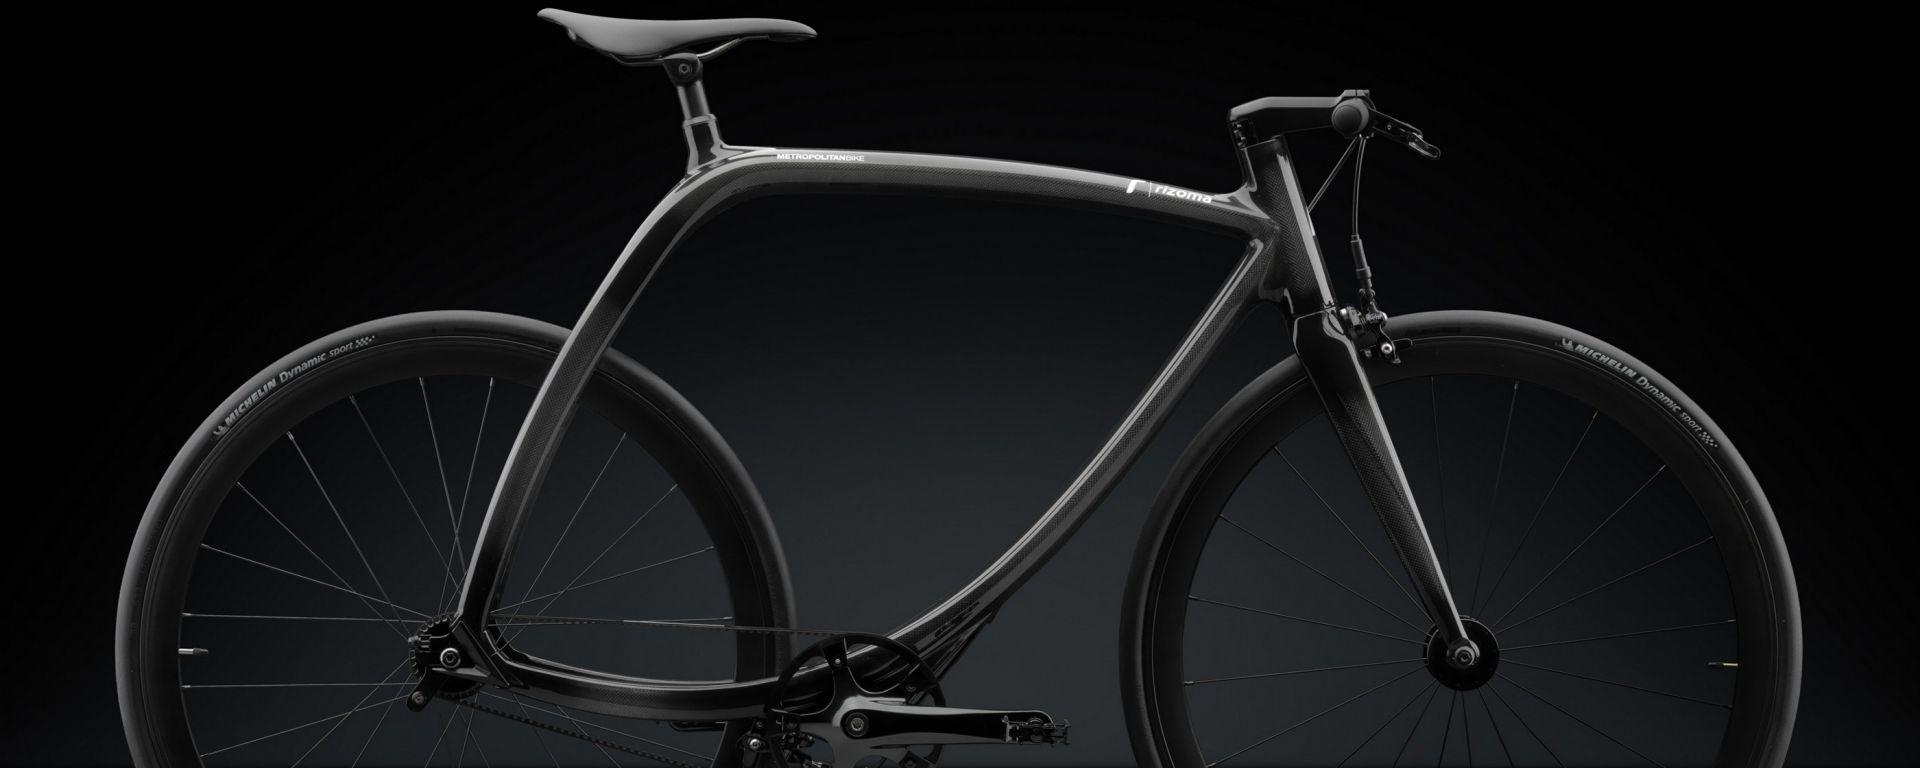 Rizoma Metropolitanbike R77